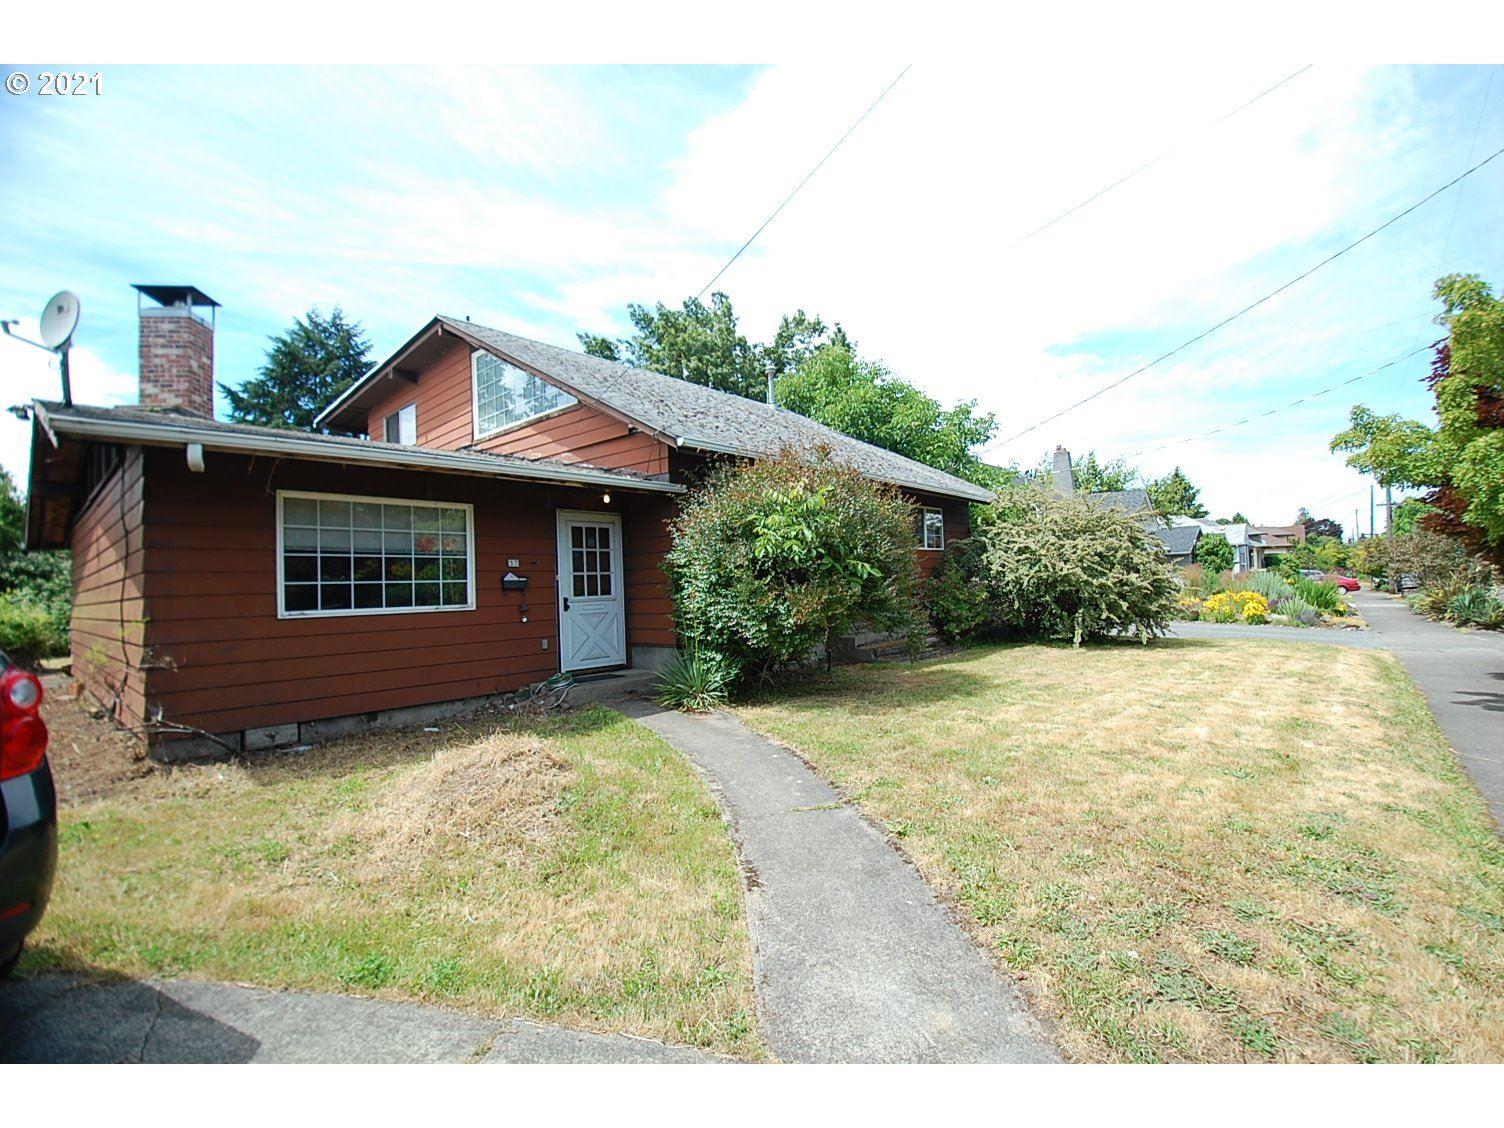 37 NE 78TH AVE, Portland, OR 97213 - MLS#: 21643564